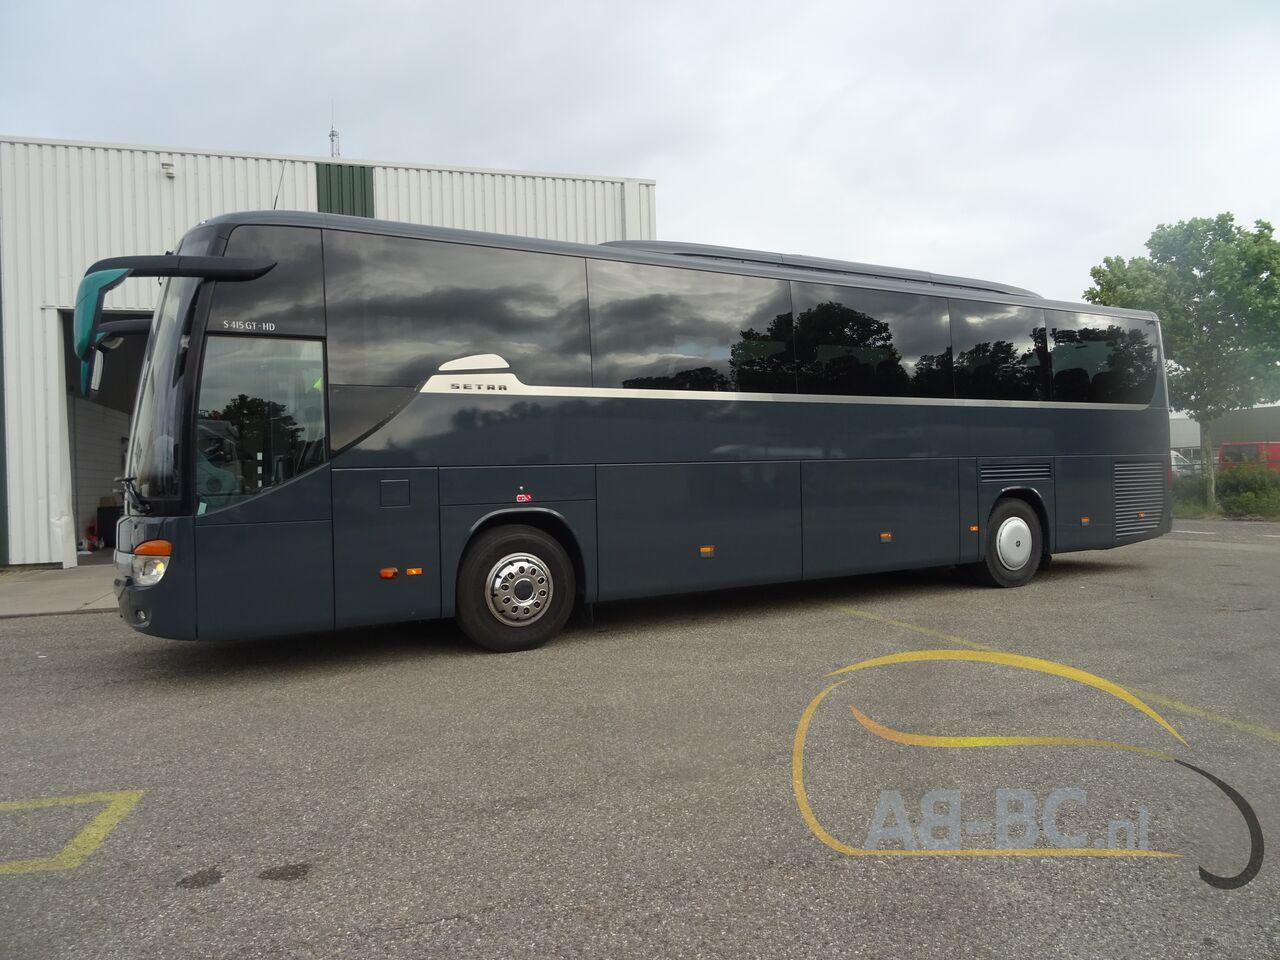 coach-busSETRA-S415-GT-HD-FINAL-EDITION---1627456994313009020_big_4c0f2f104efd6da6e0fcf0208ad505fa--21050713010665719300